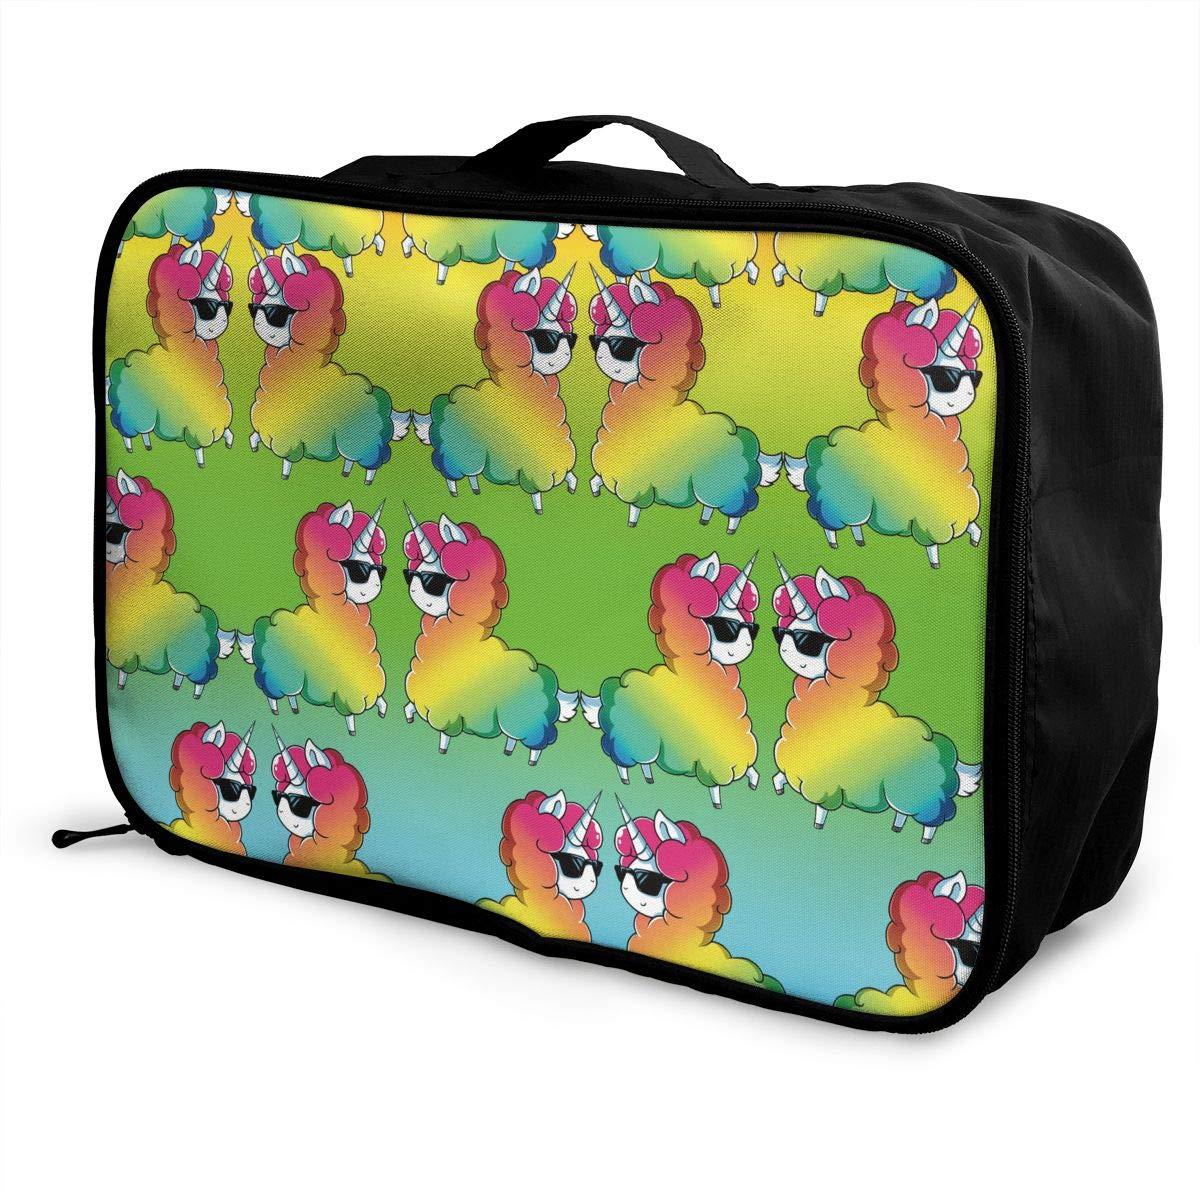 Lightweight Large Capacity Duffel Portable Luggage Bag Cute Funny Llama Rainbow Alpaca Travel Waterproof Foldable Storage Carry Tote Bag